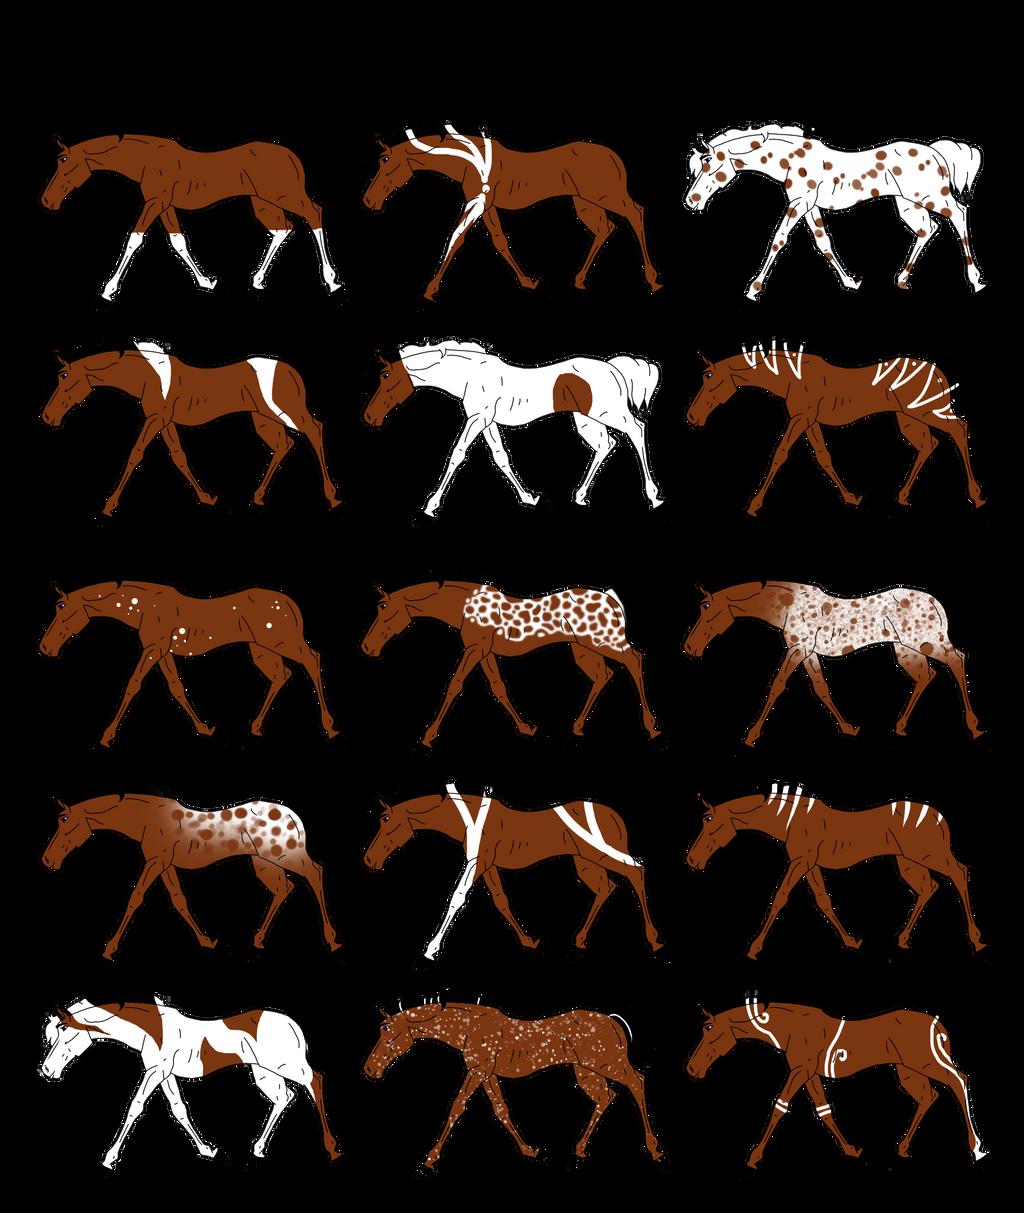 Pandori Aura Equine - Markings Chart by carlmoon on DeviantArt